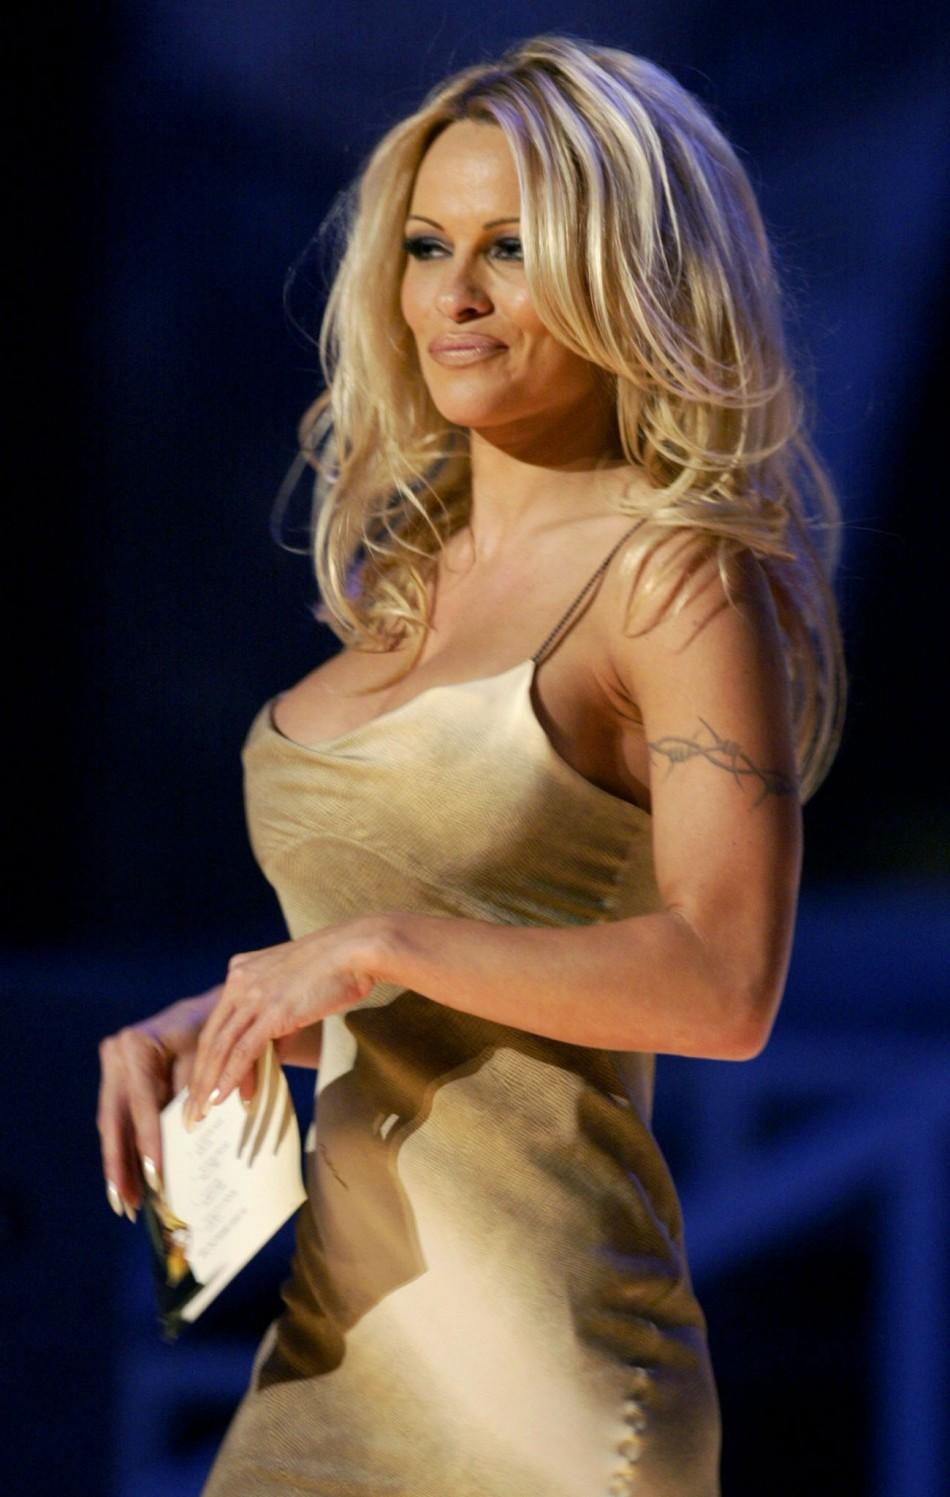 8. Pamela Anderson